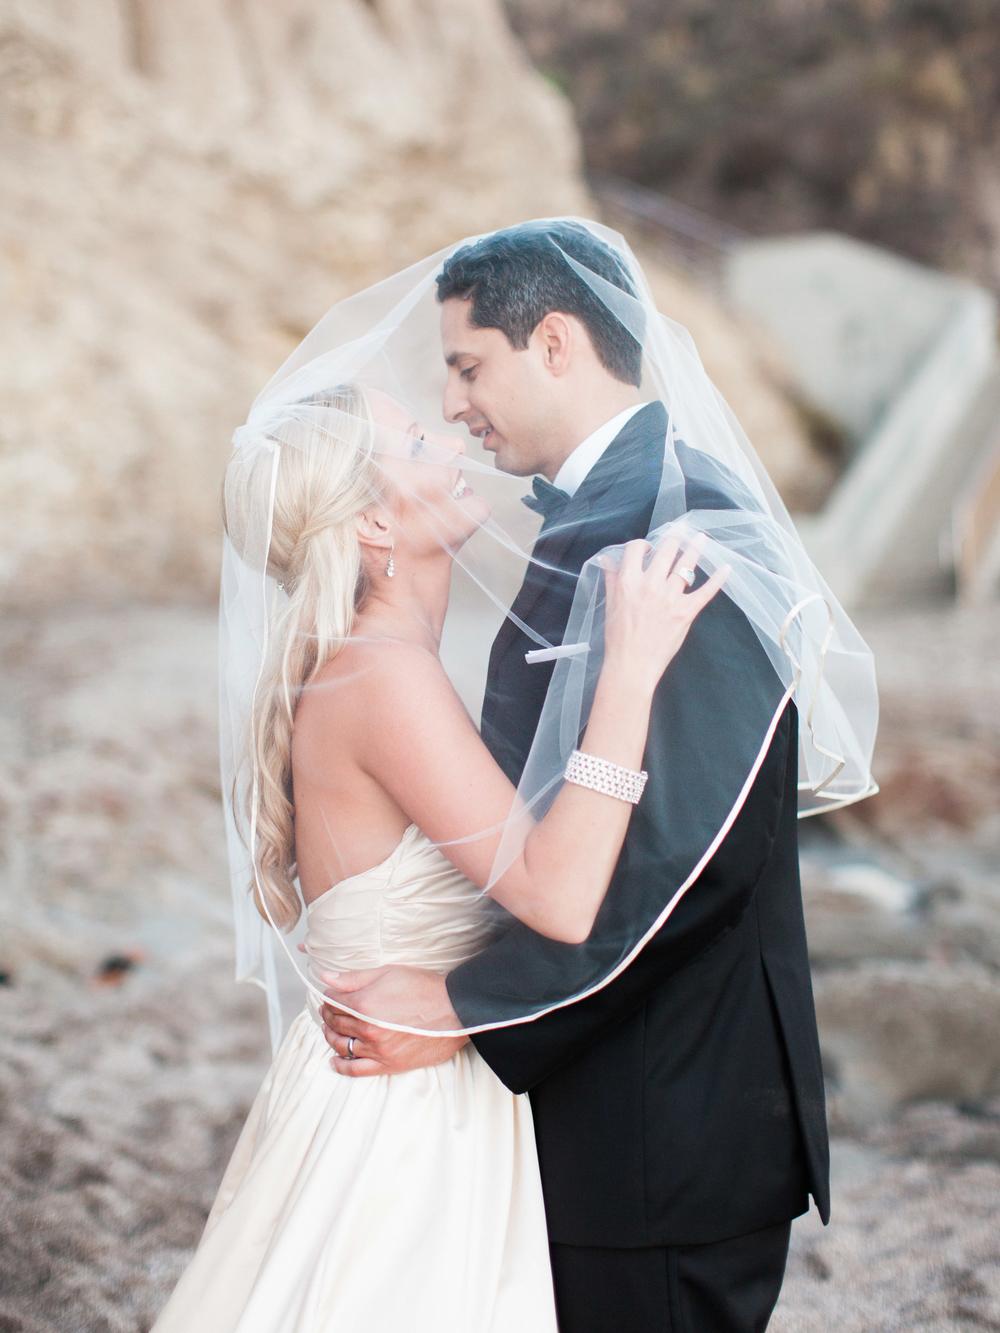 Santa Barbara Wedding Photographer Skyla Walton (2 of 7).jpg